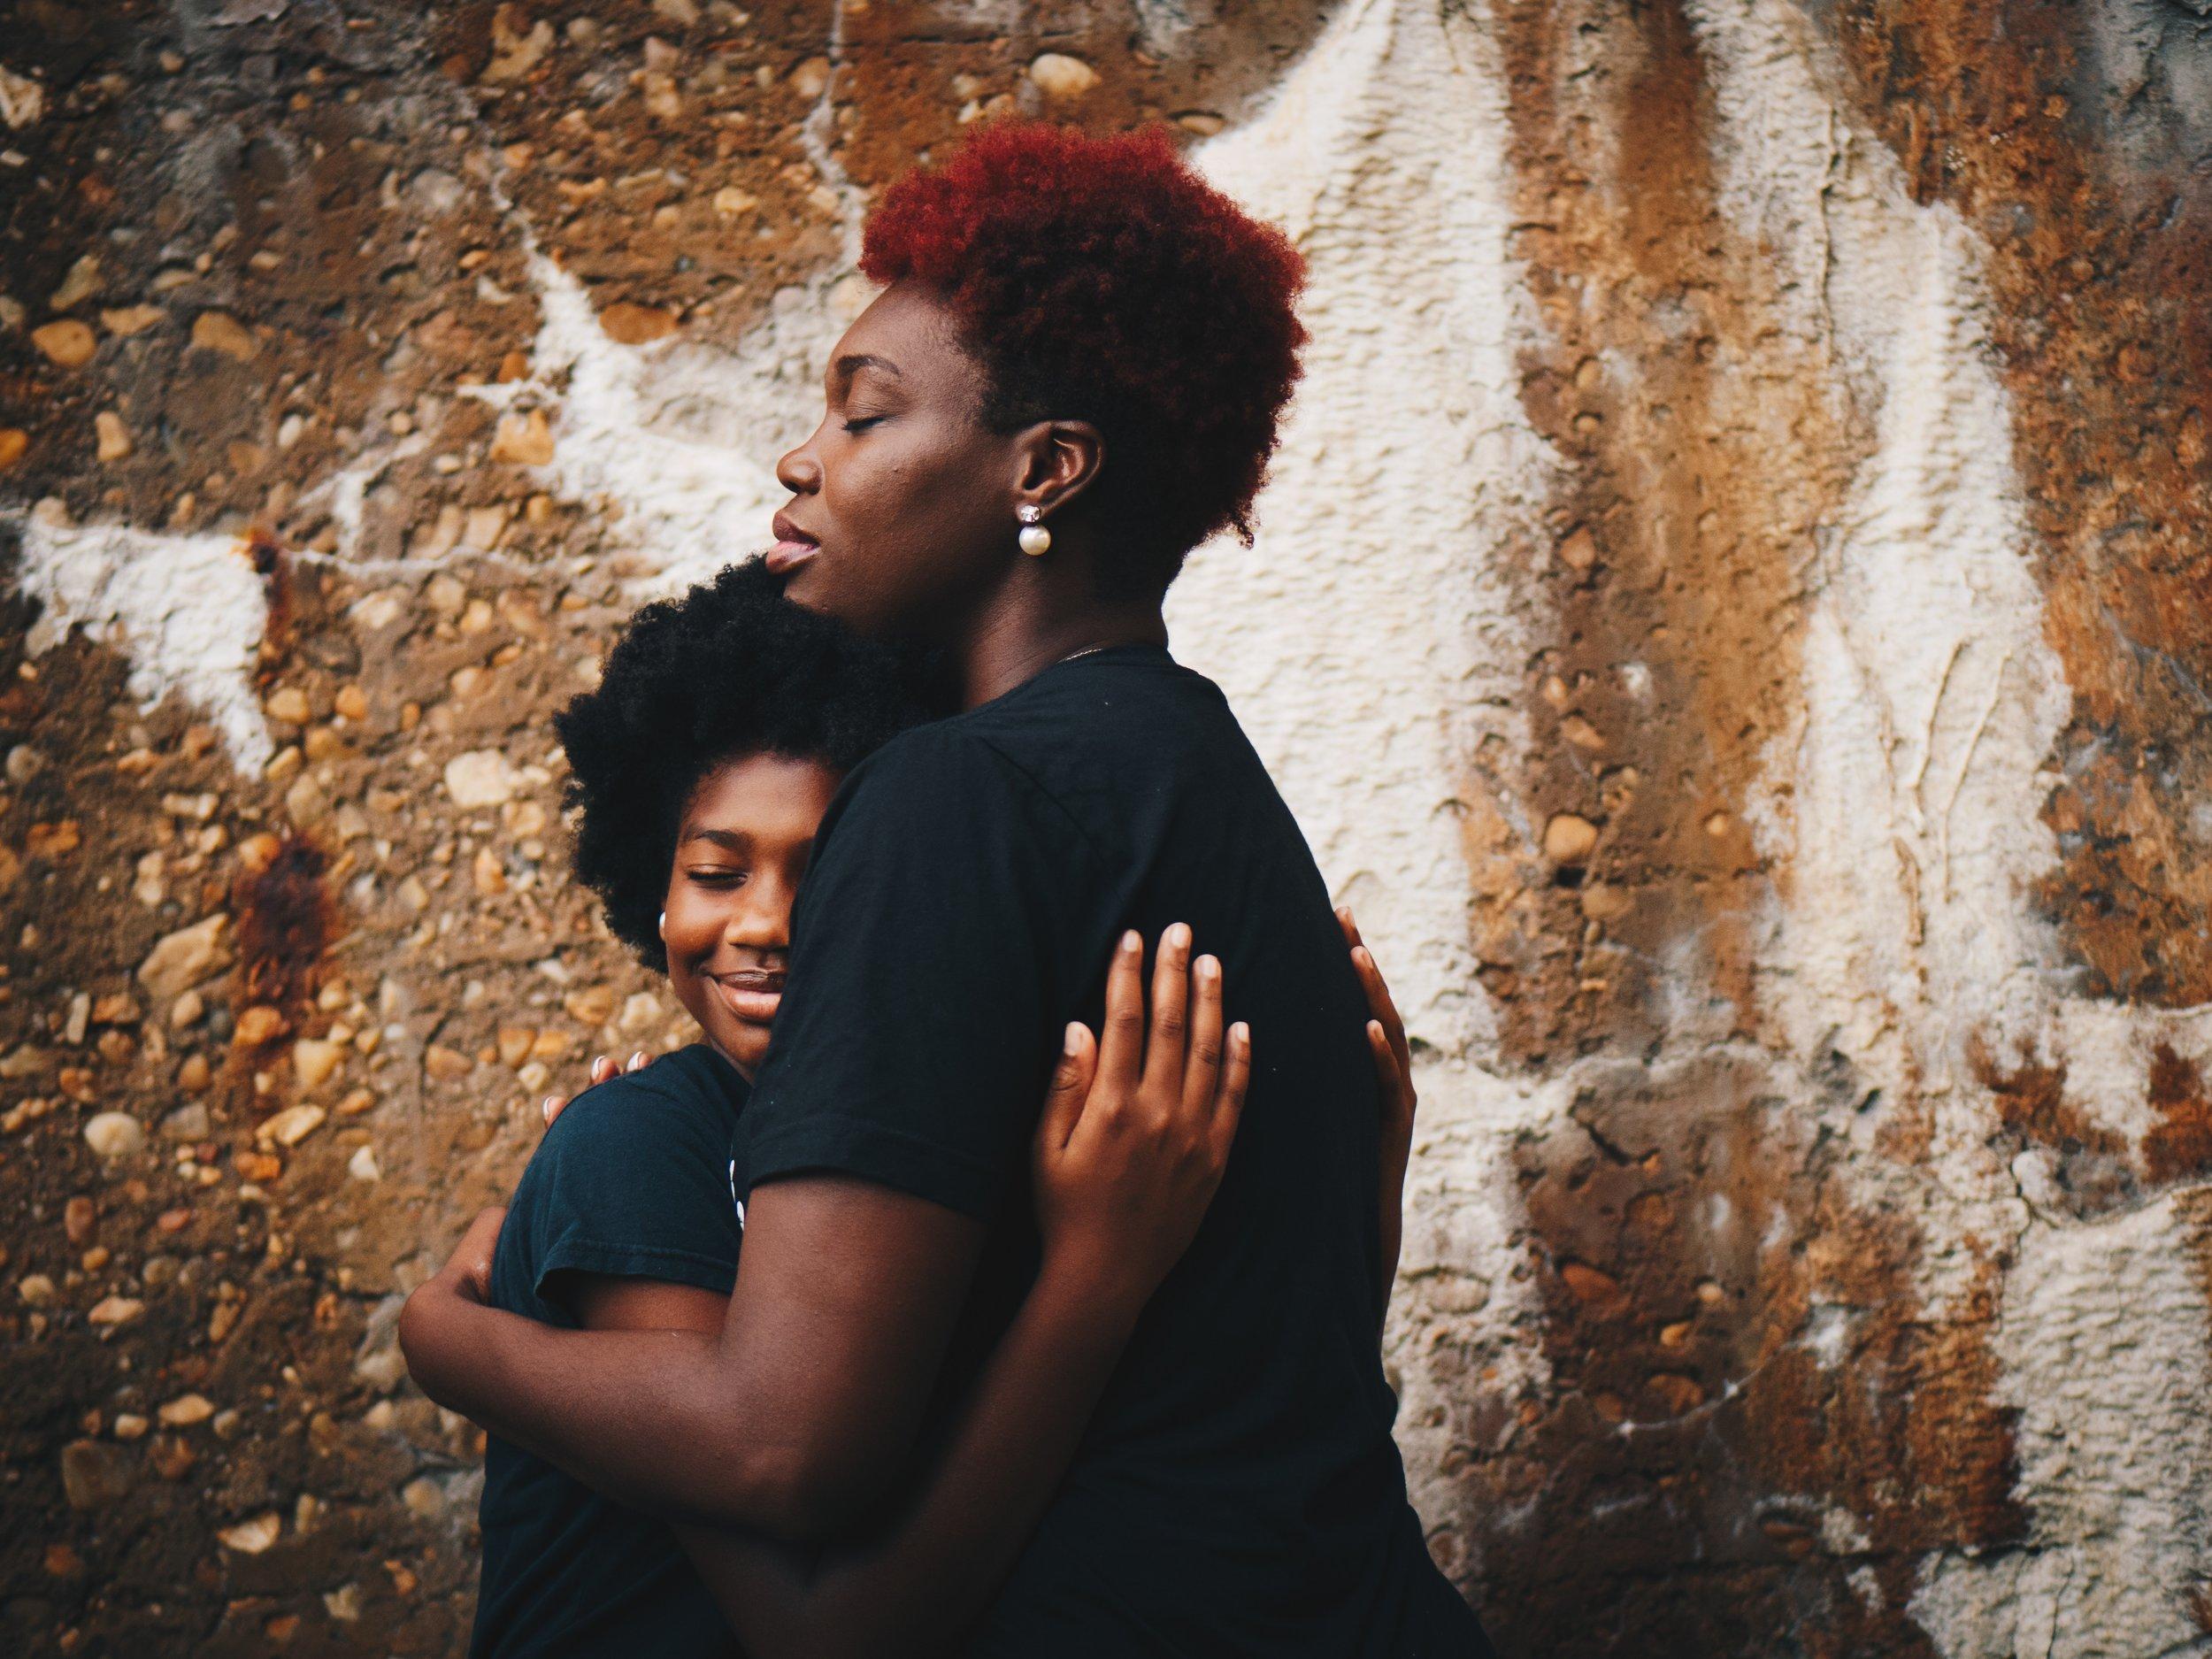 Mother hugging teenager.